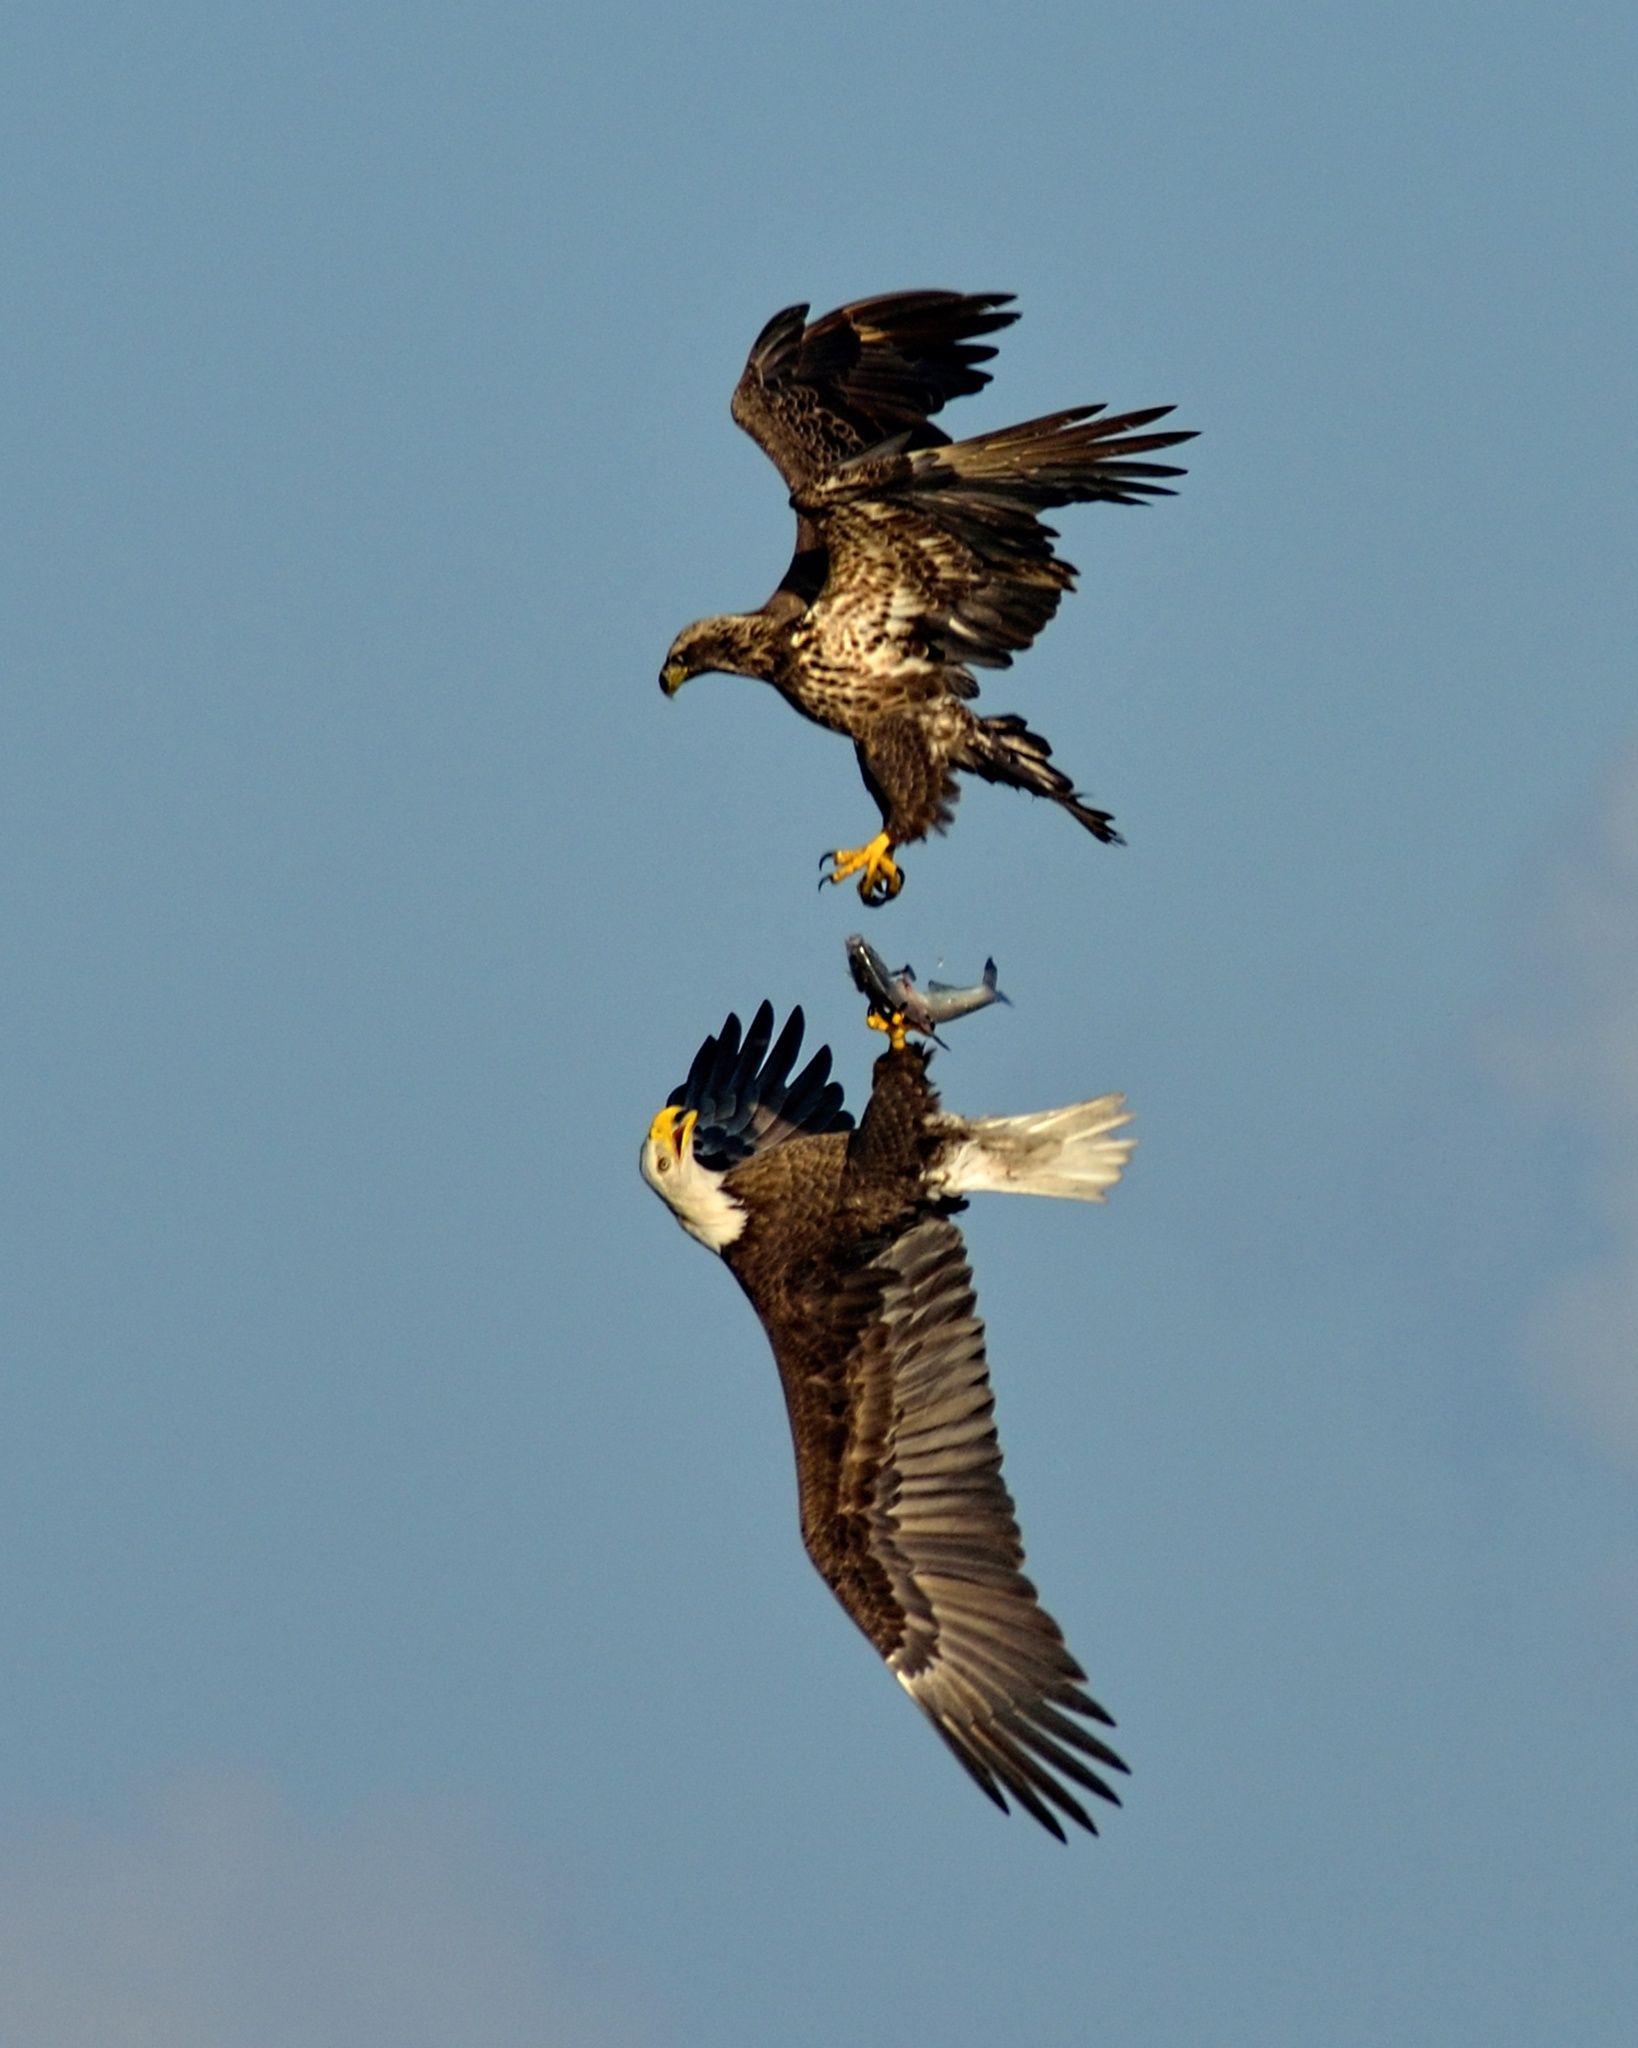 Photo Aerial Battle by Michael Parish on 500px